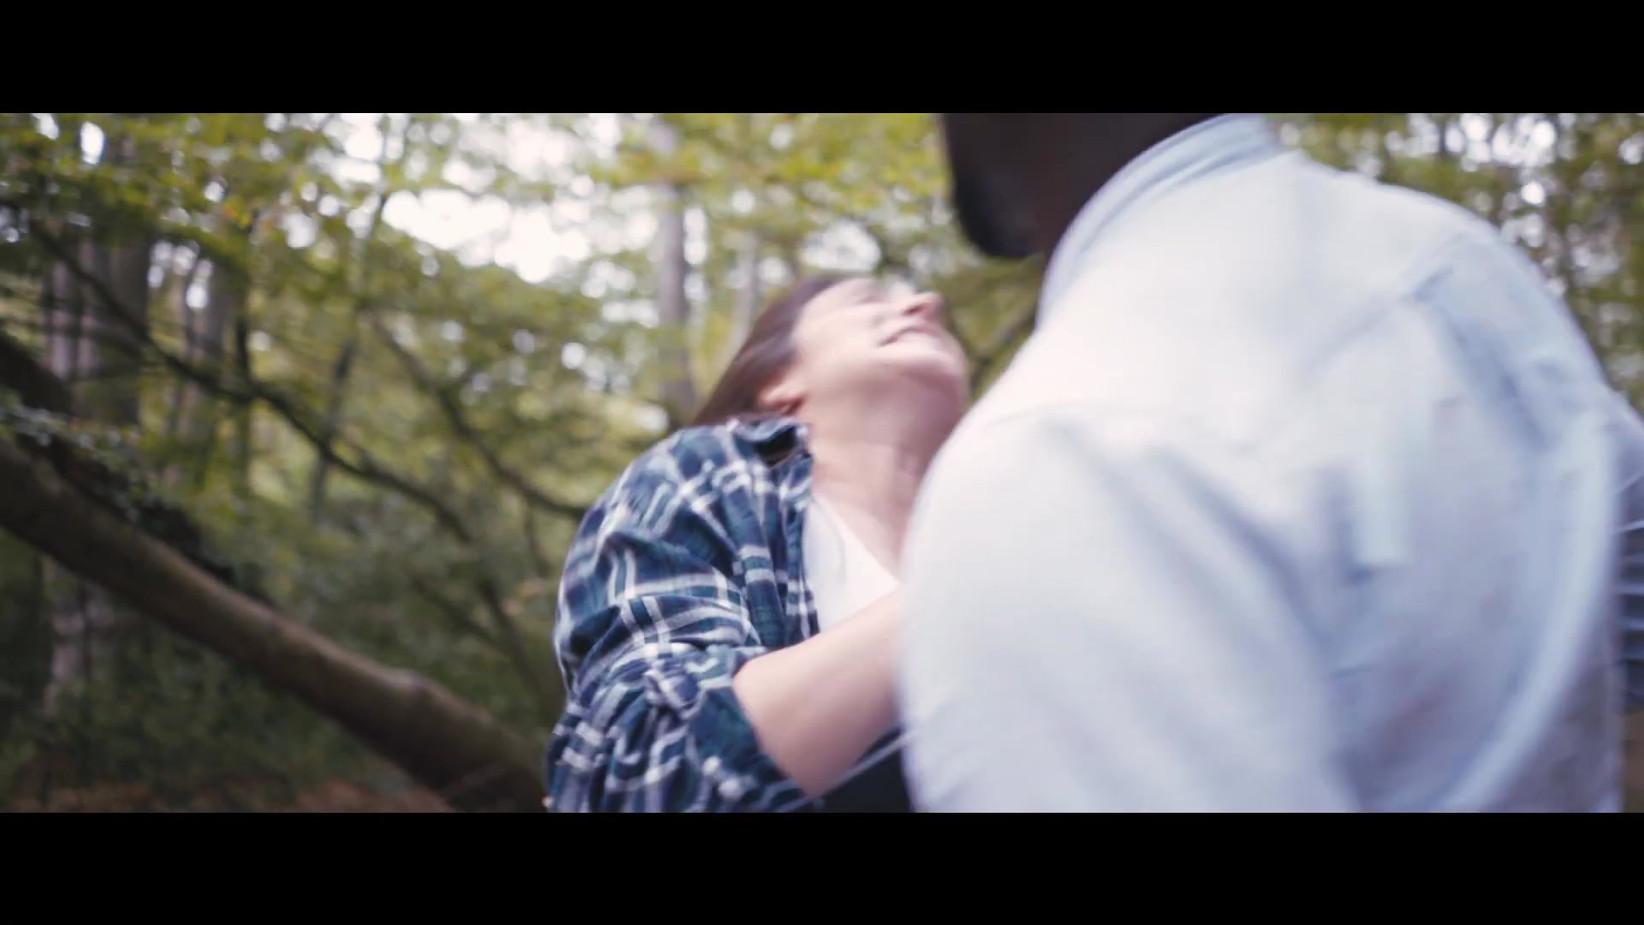 Greek Tragedies | Music Video